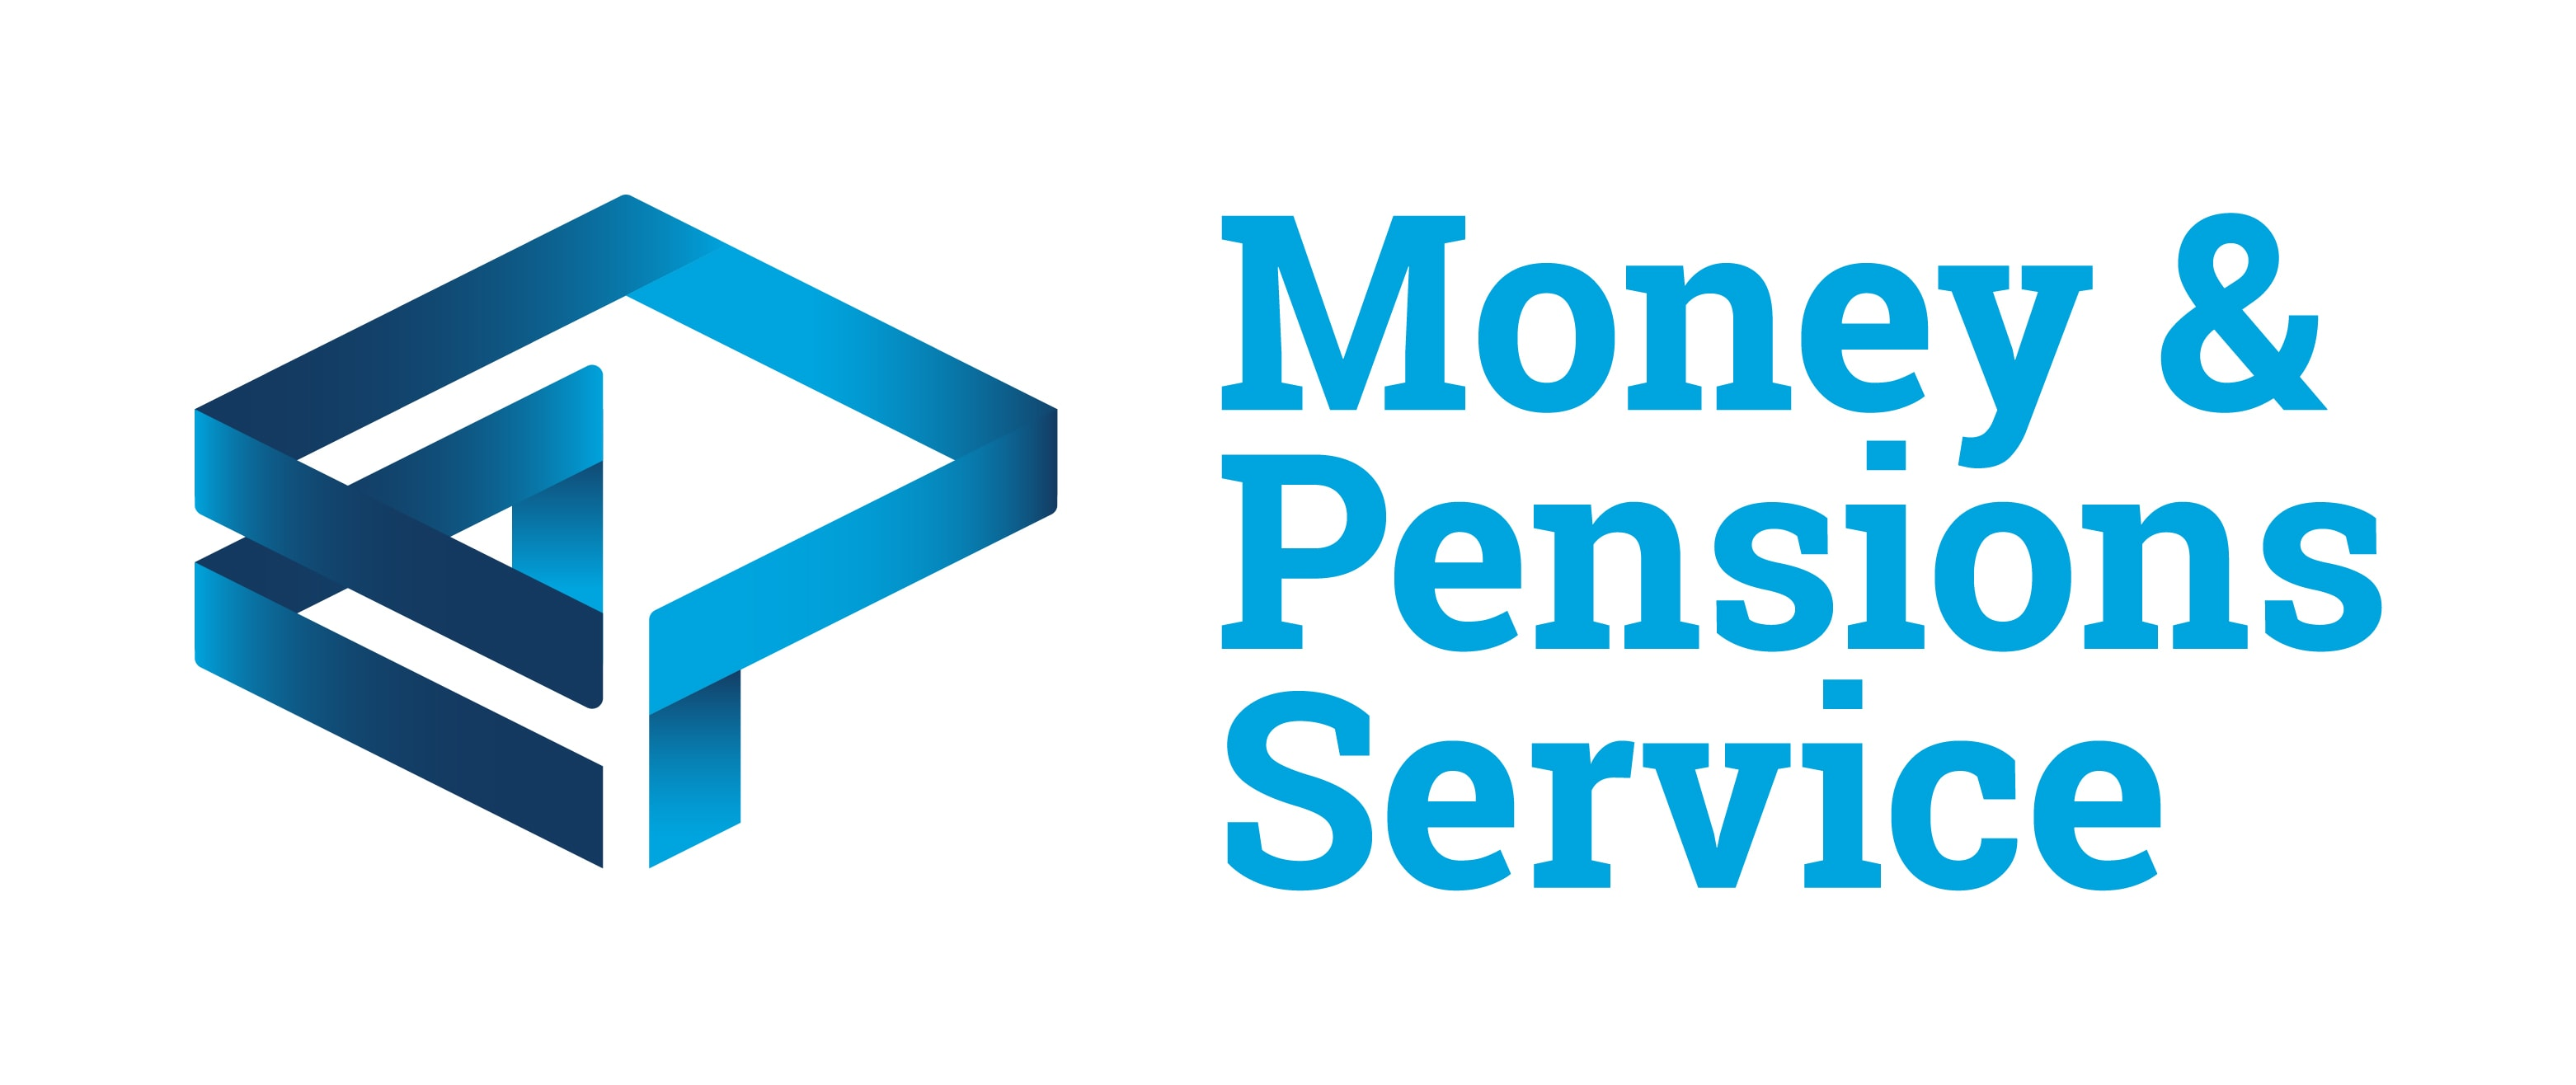 moneyandpension